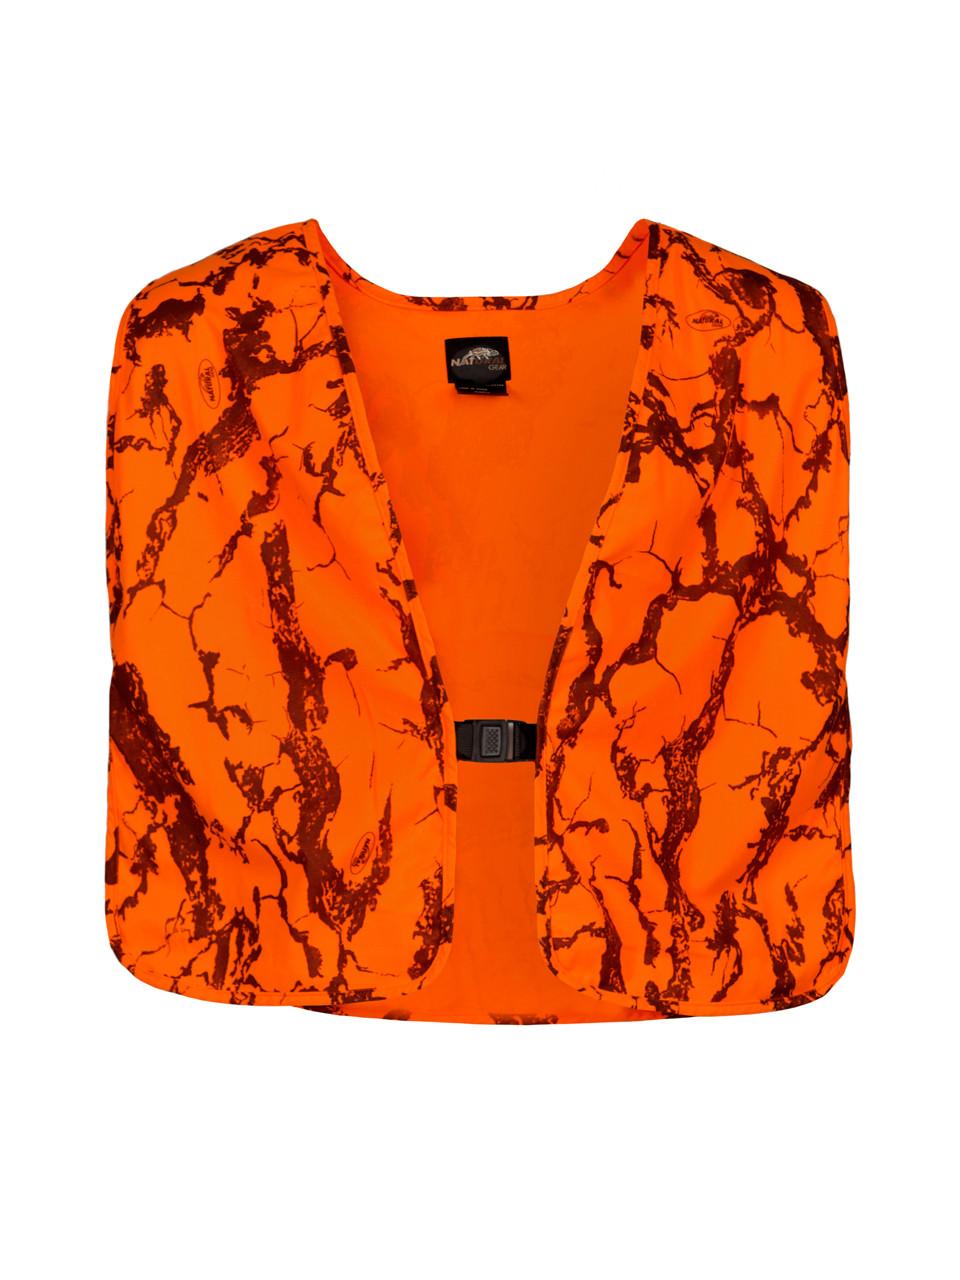 338039e7321ab Blaze Camo Safety Vest - Hunter's Orange Vest - Natural Gear